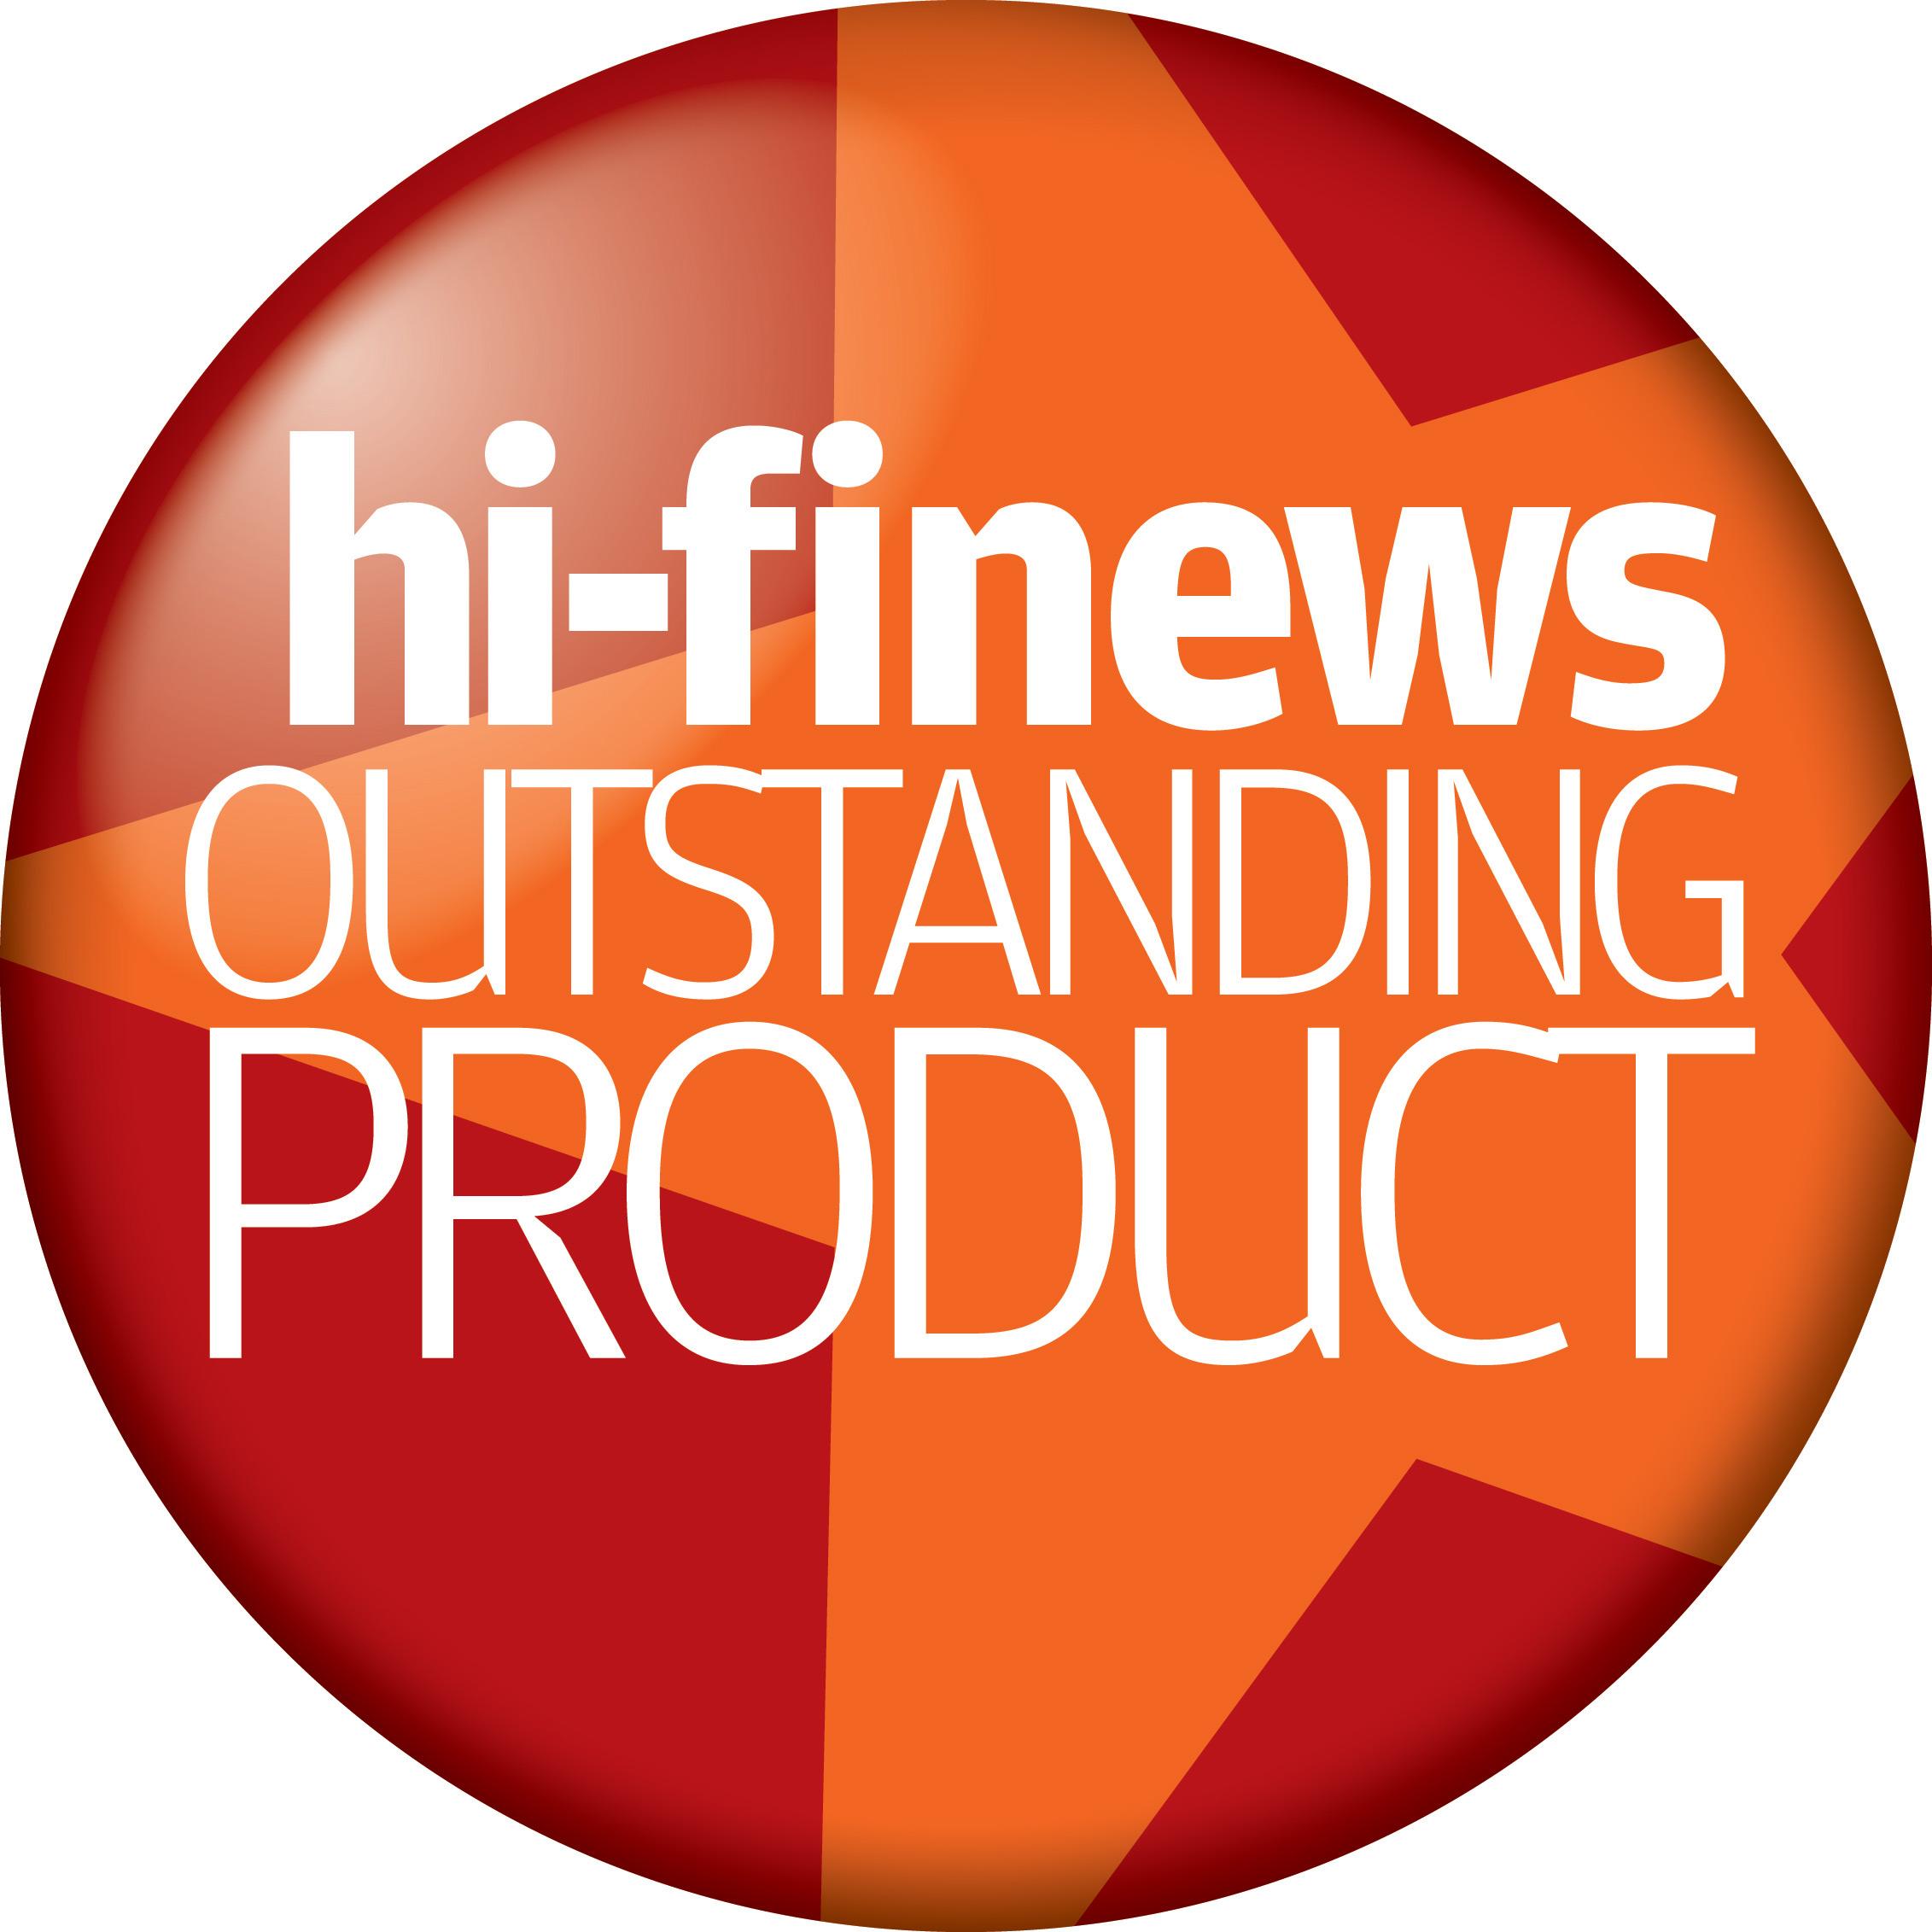 web-HFN-latest-ver---Outstanding-Product.jpg